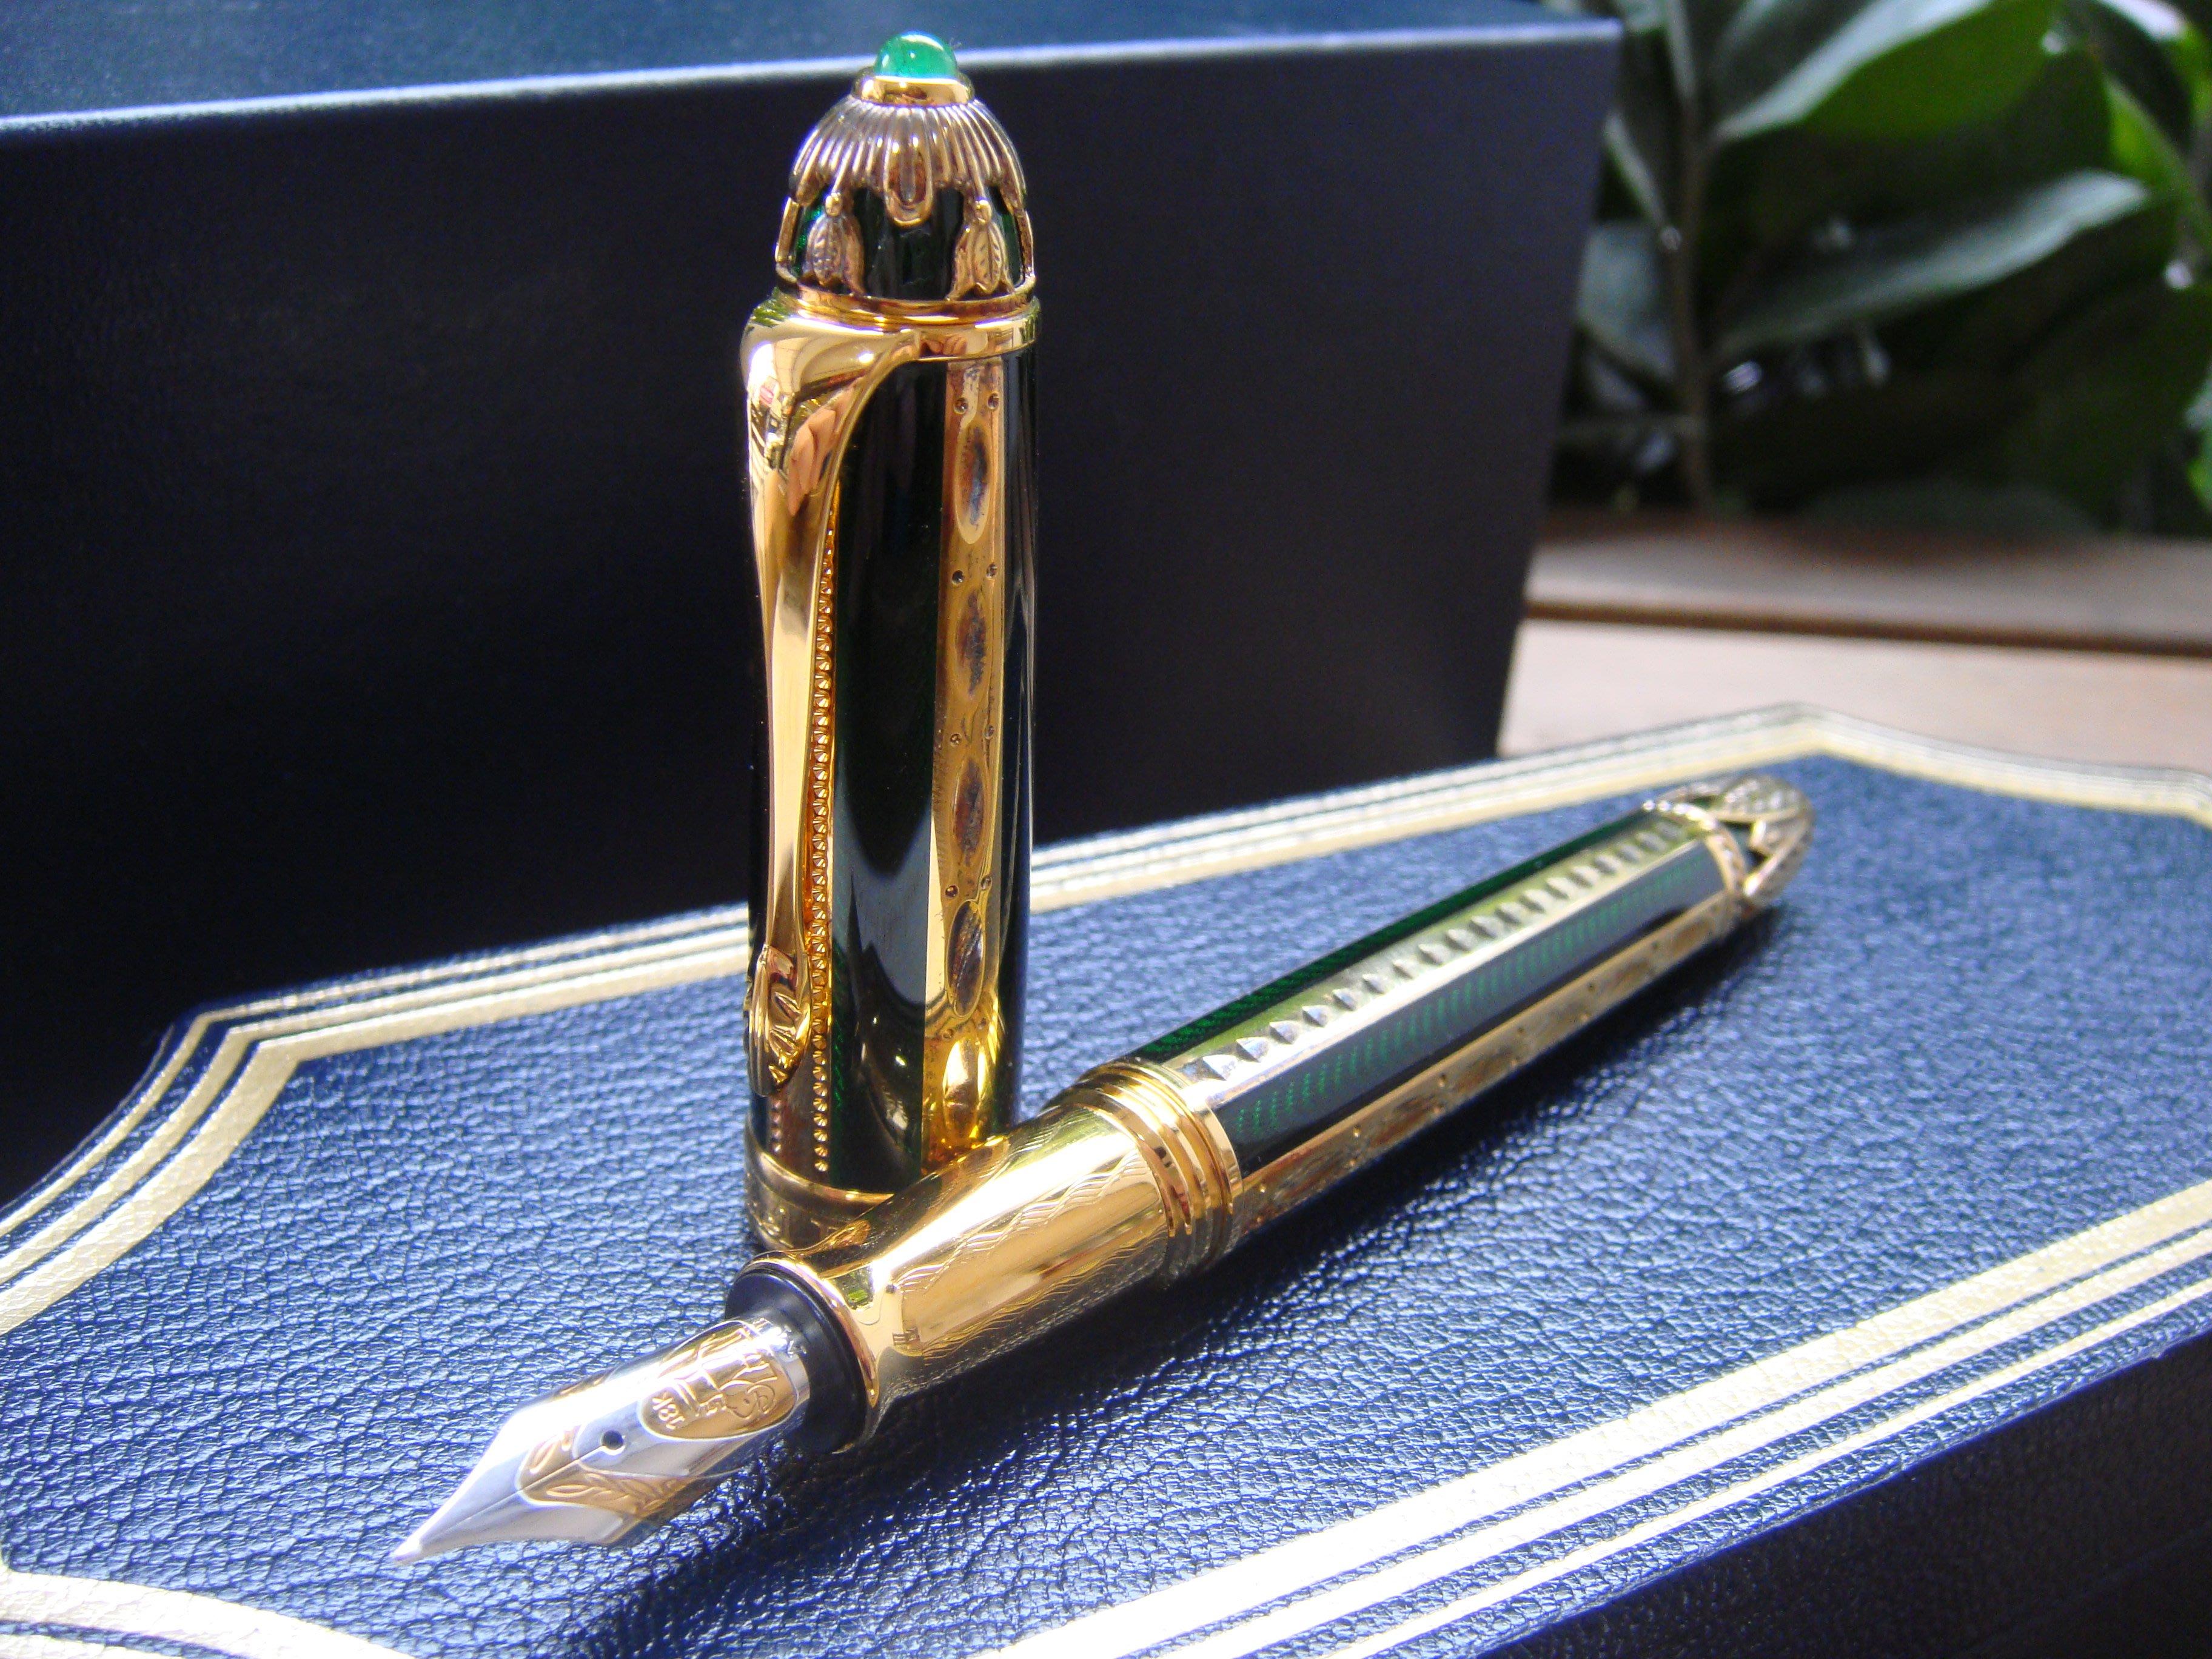 Michel Perchin 綠色沙皇 Green&Gold Rib Faberge 925 Vermeil 限量鋼筆